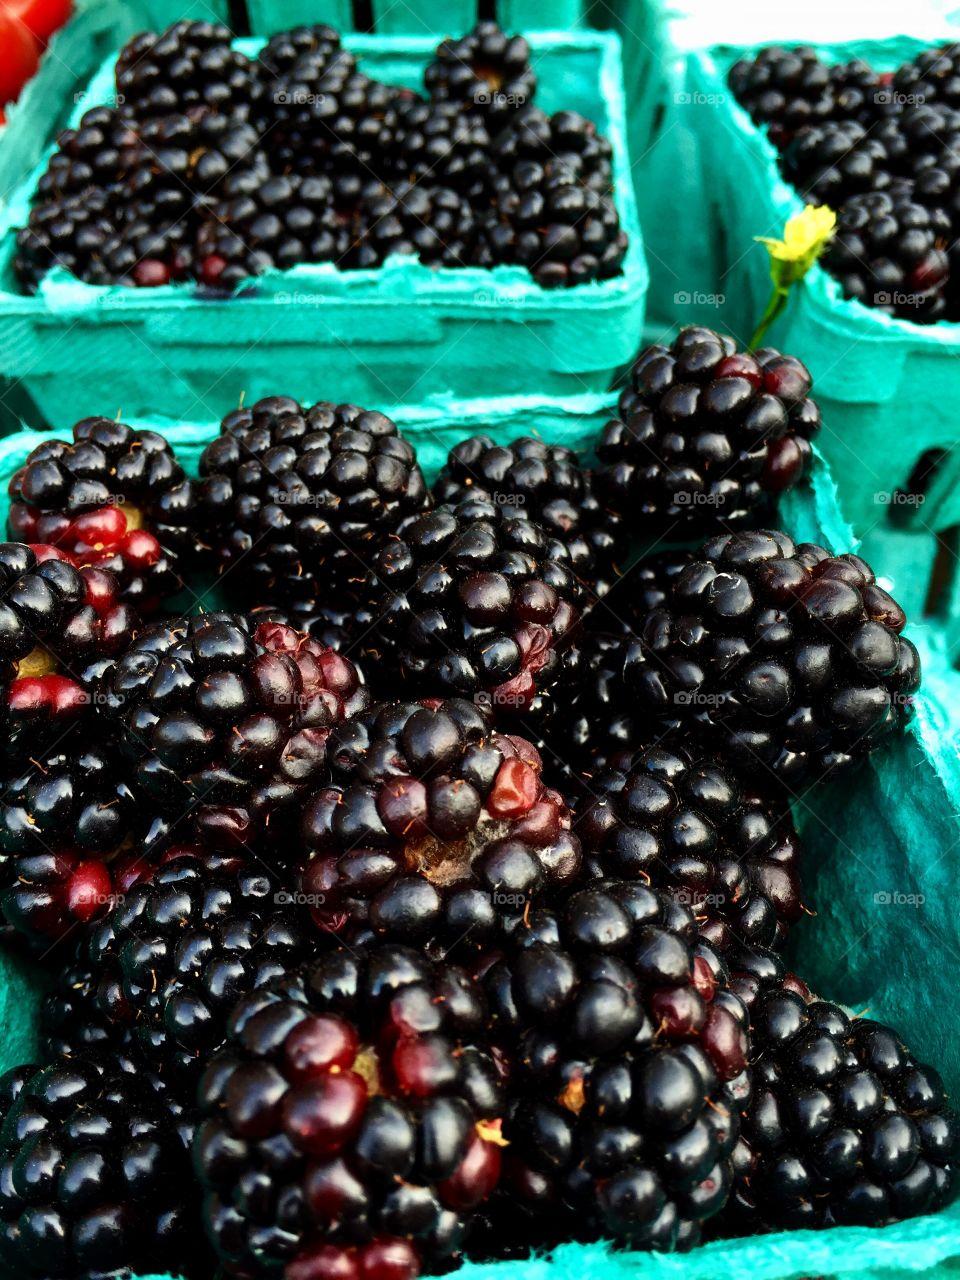 Blackberries on container